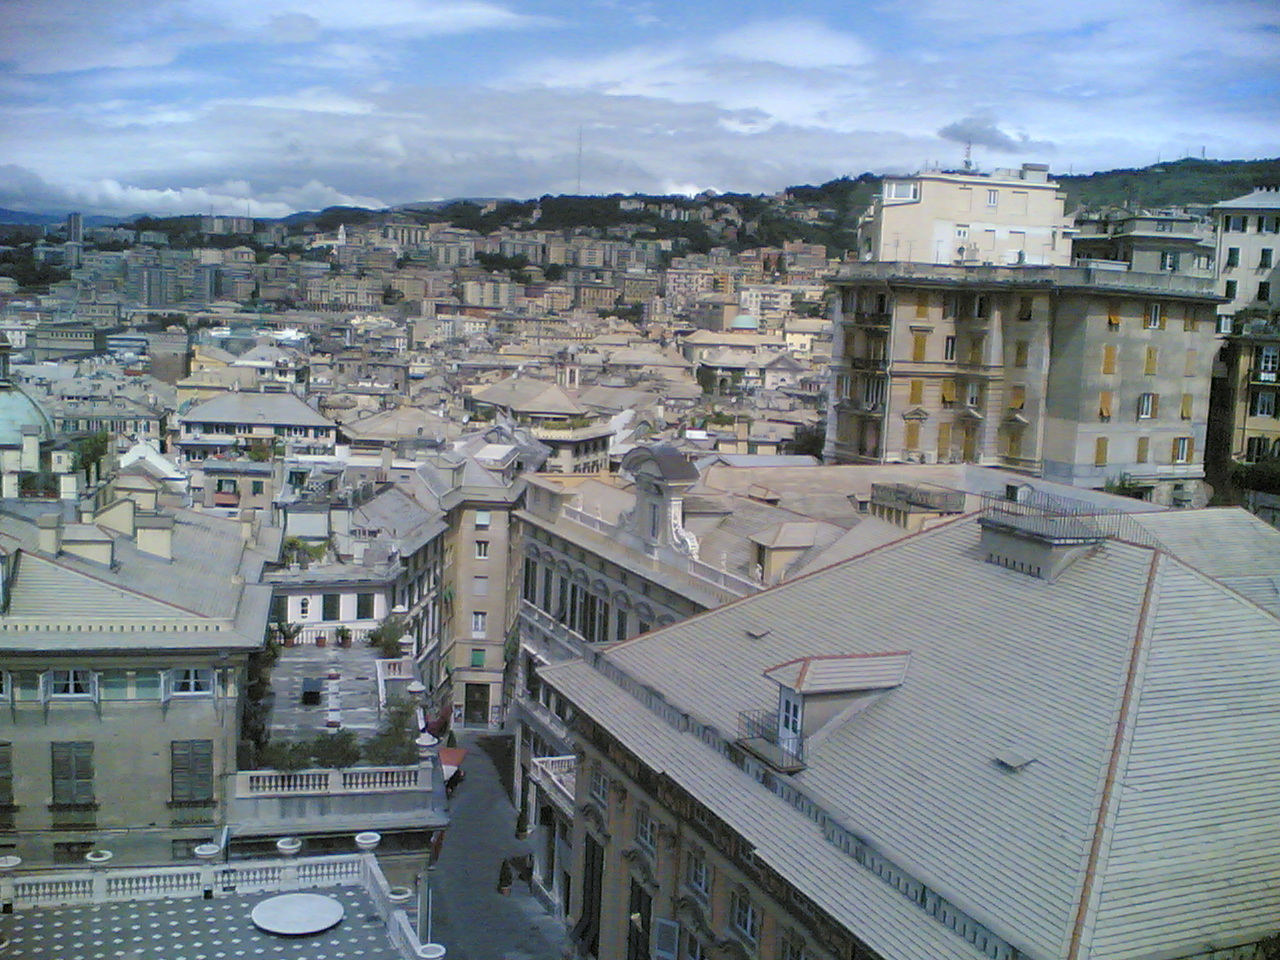 Genoa: Le Strade Nuove and the system of the Palazzi dei Rolli